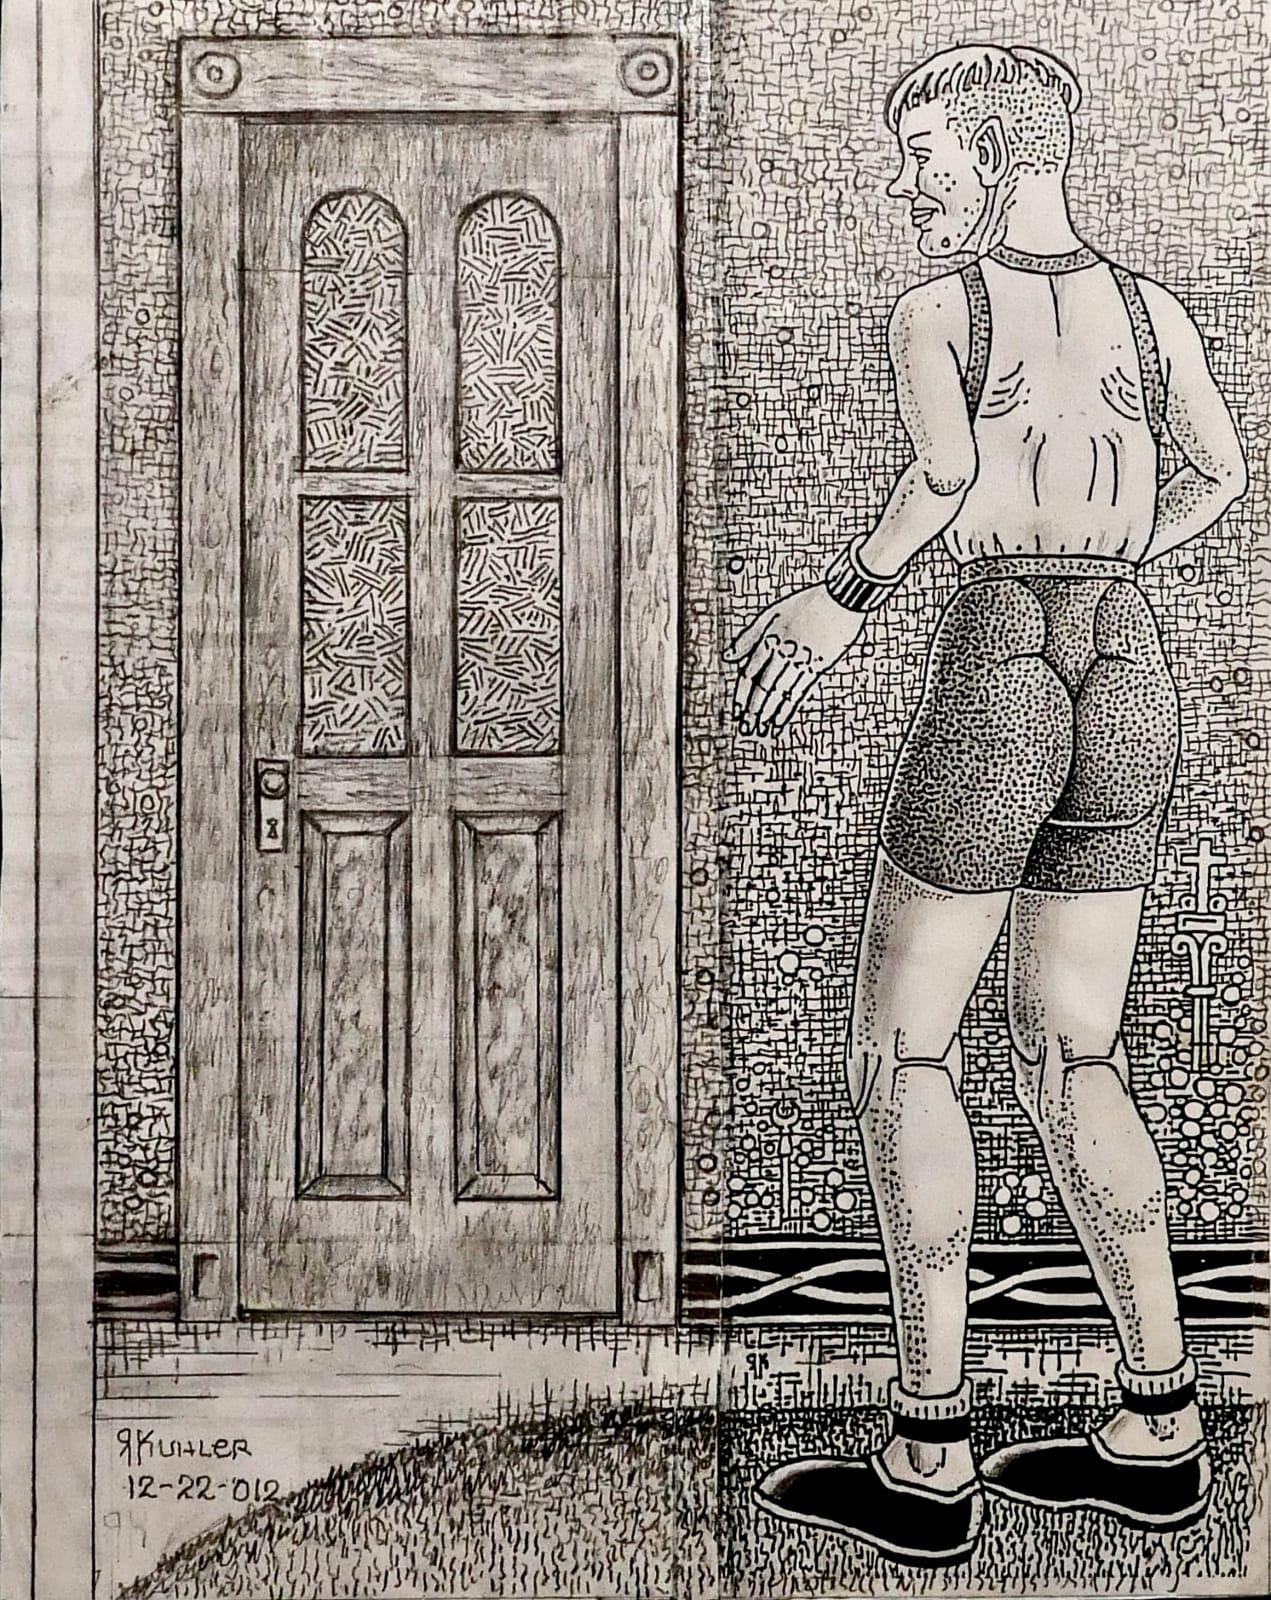 Peekle facing door, 2012 Ink, pencil, gouache on photocopy 11 x 8 1/2 in (RK 114) $7,000